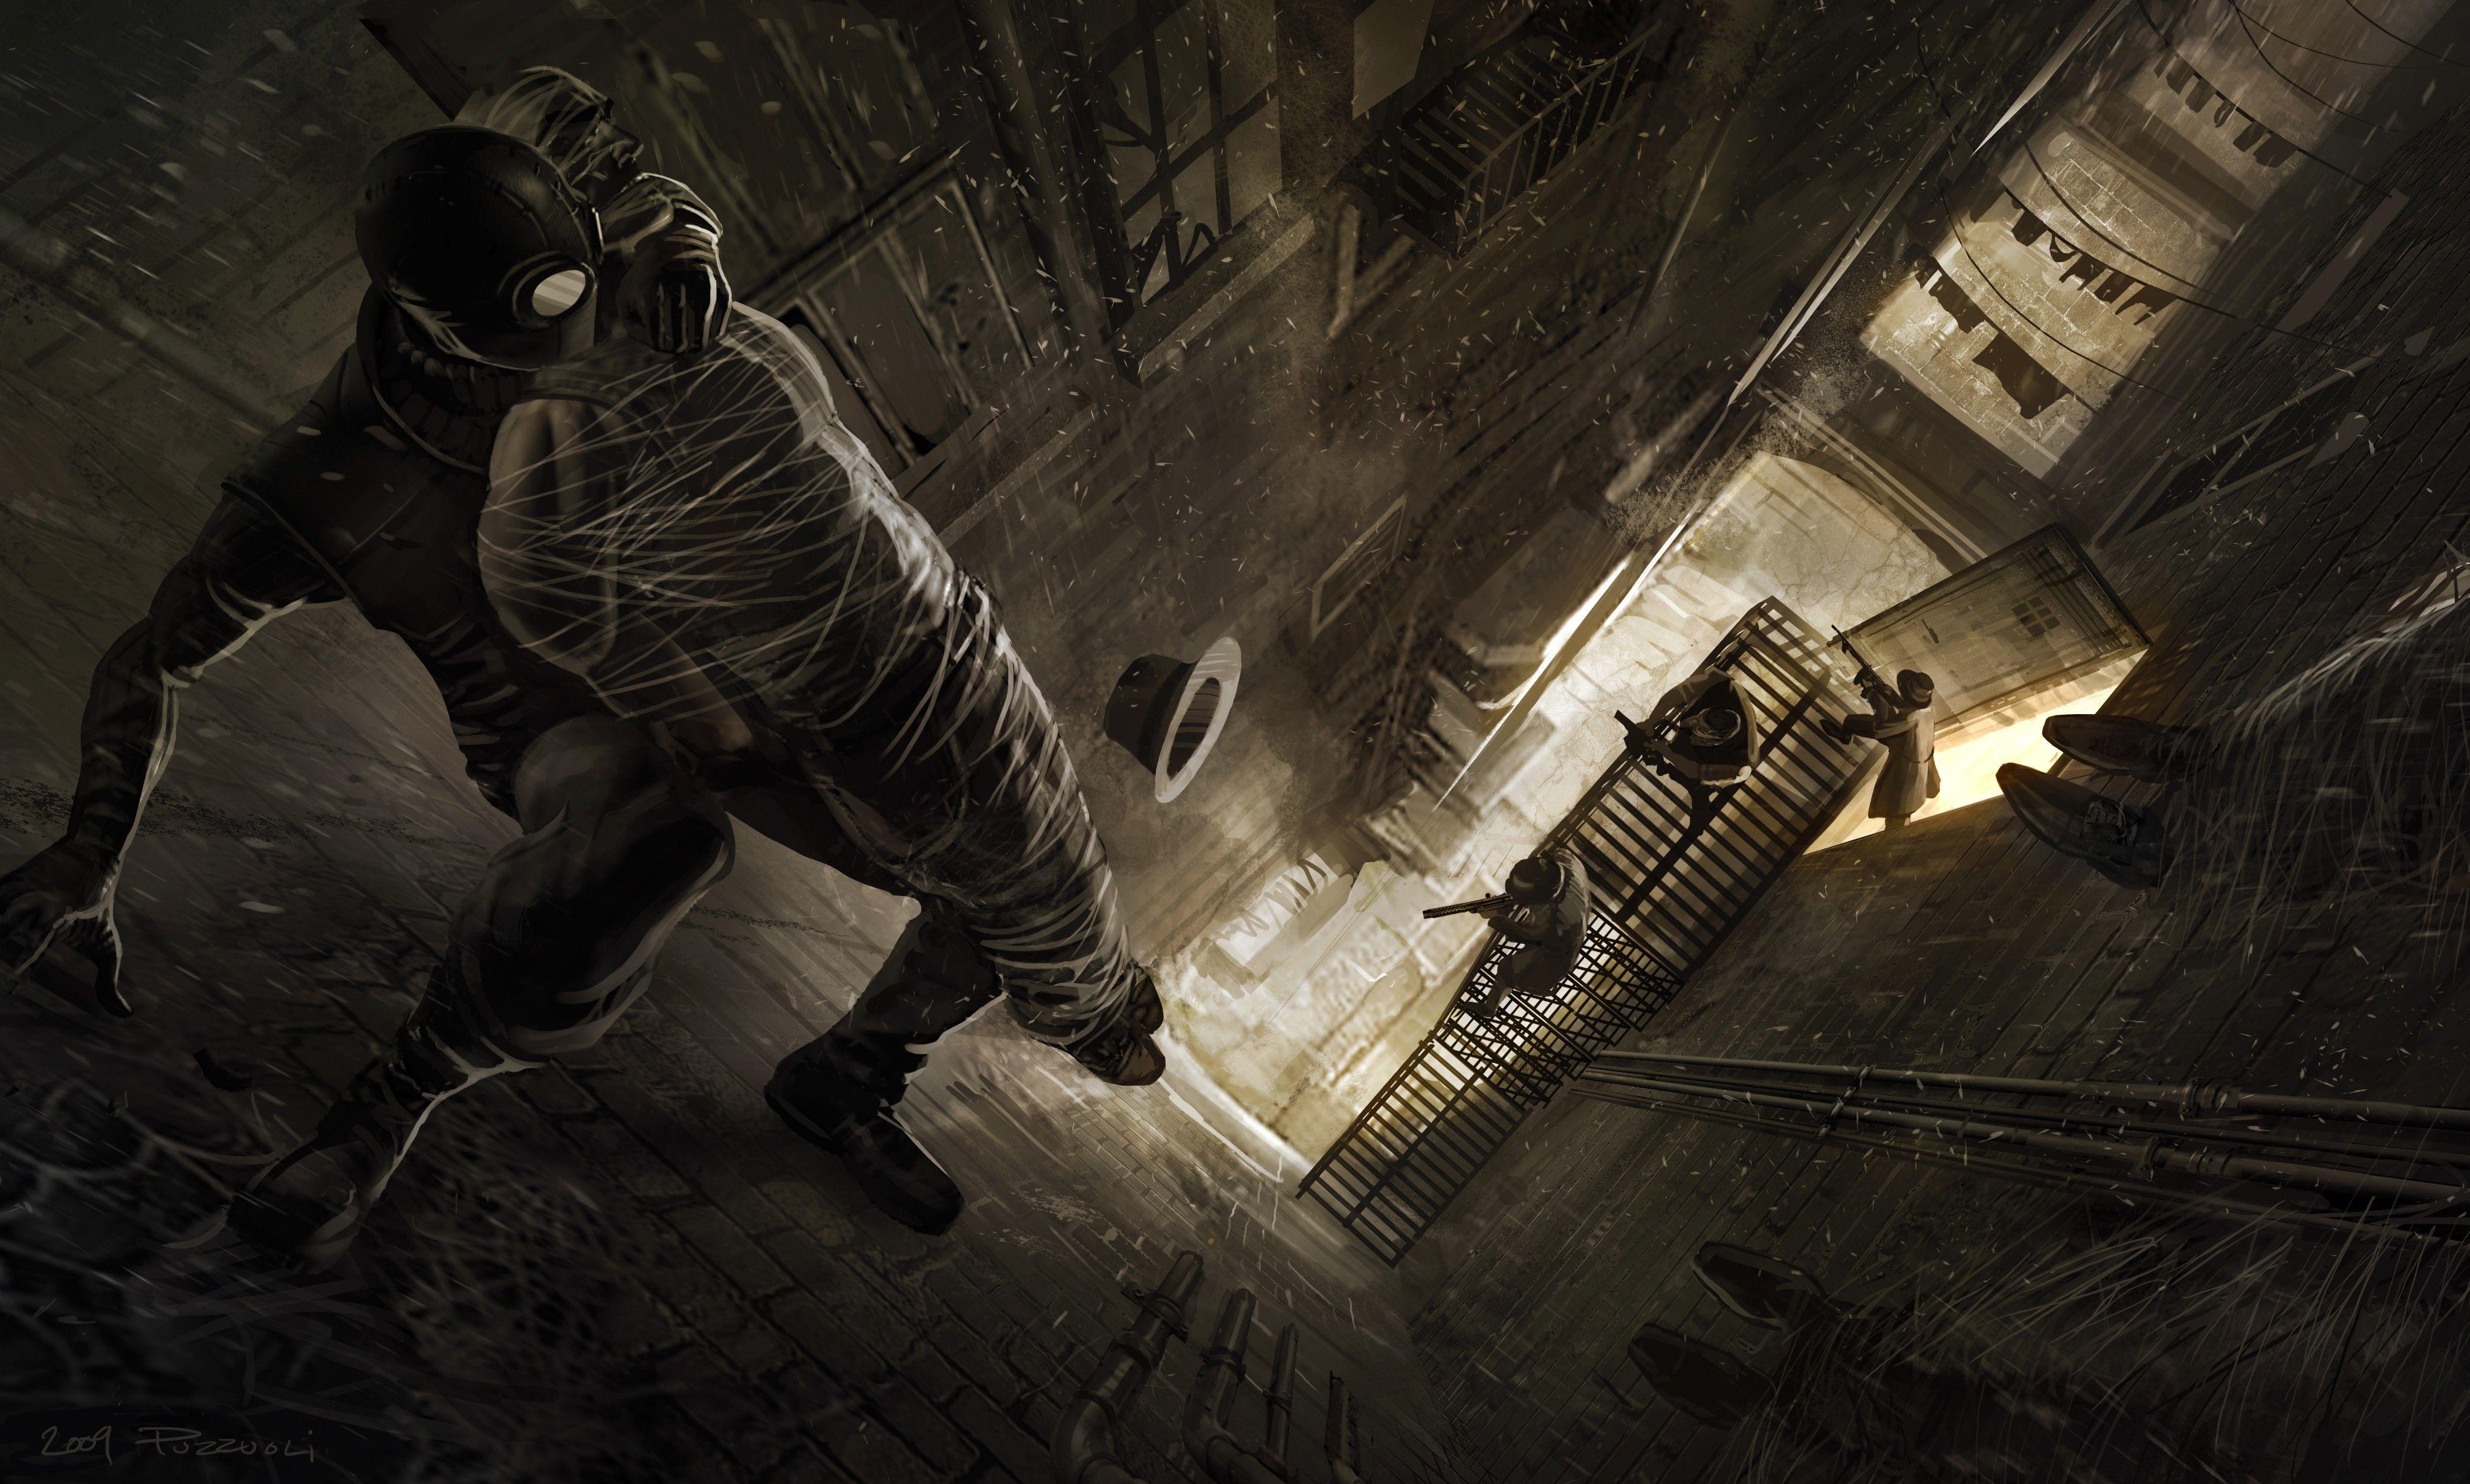 Pin By D Wayne Henry On Conceptual Background Noir Spiderman Desktop Wallpapers Backgrounds Man Wallpaper